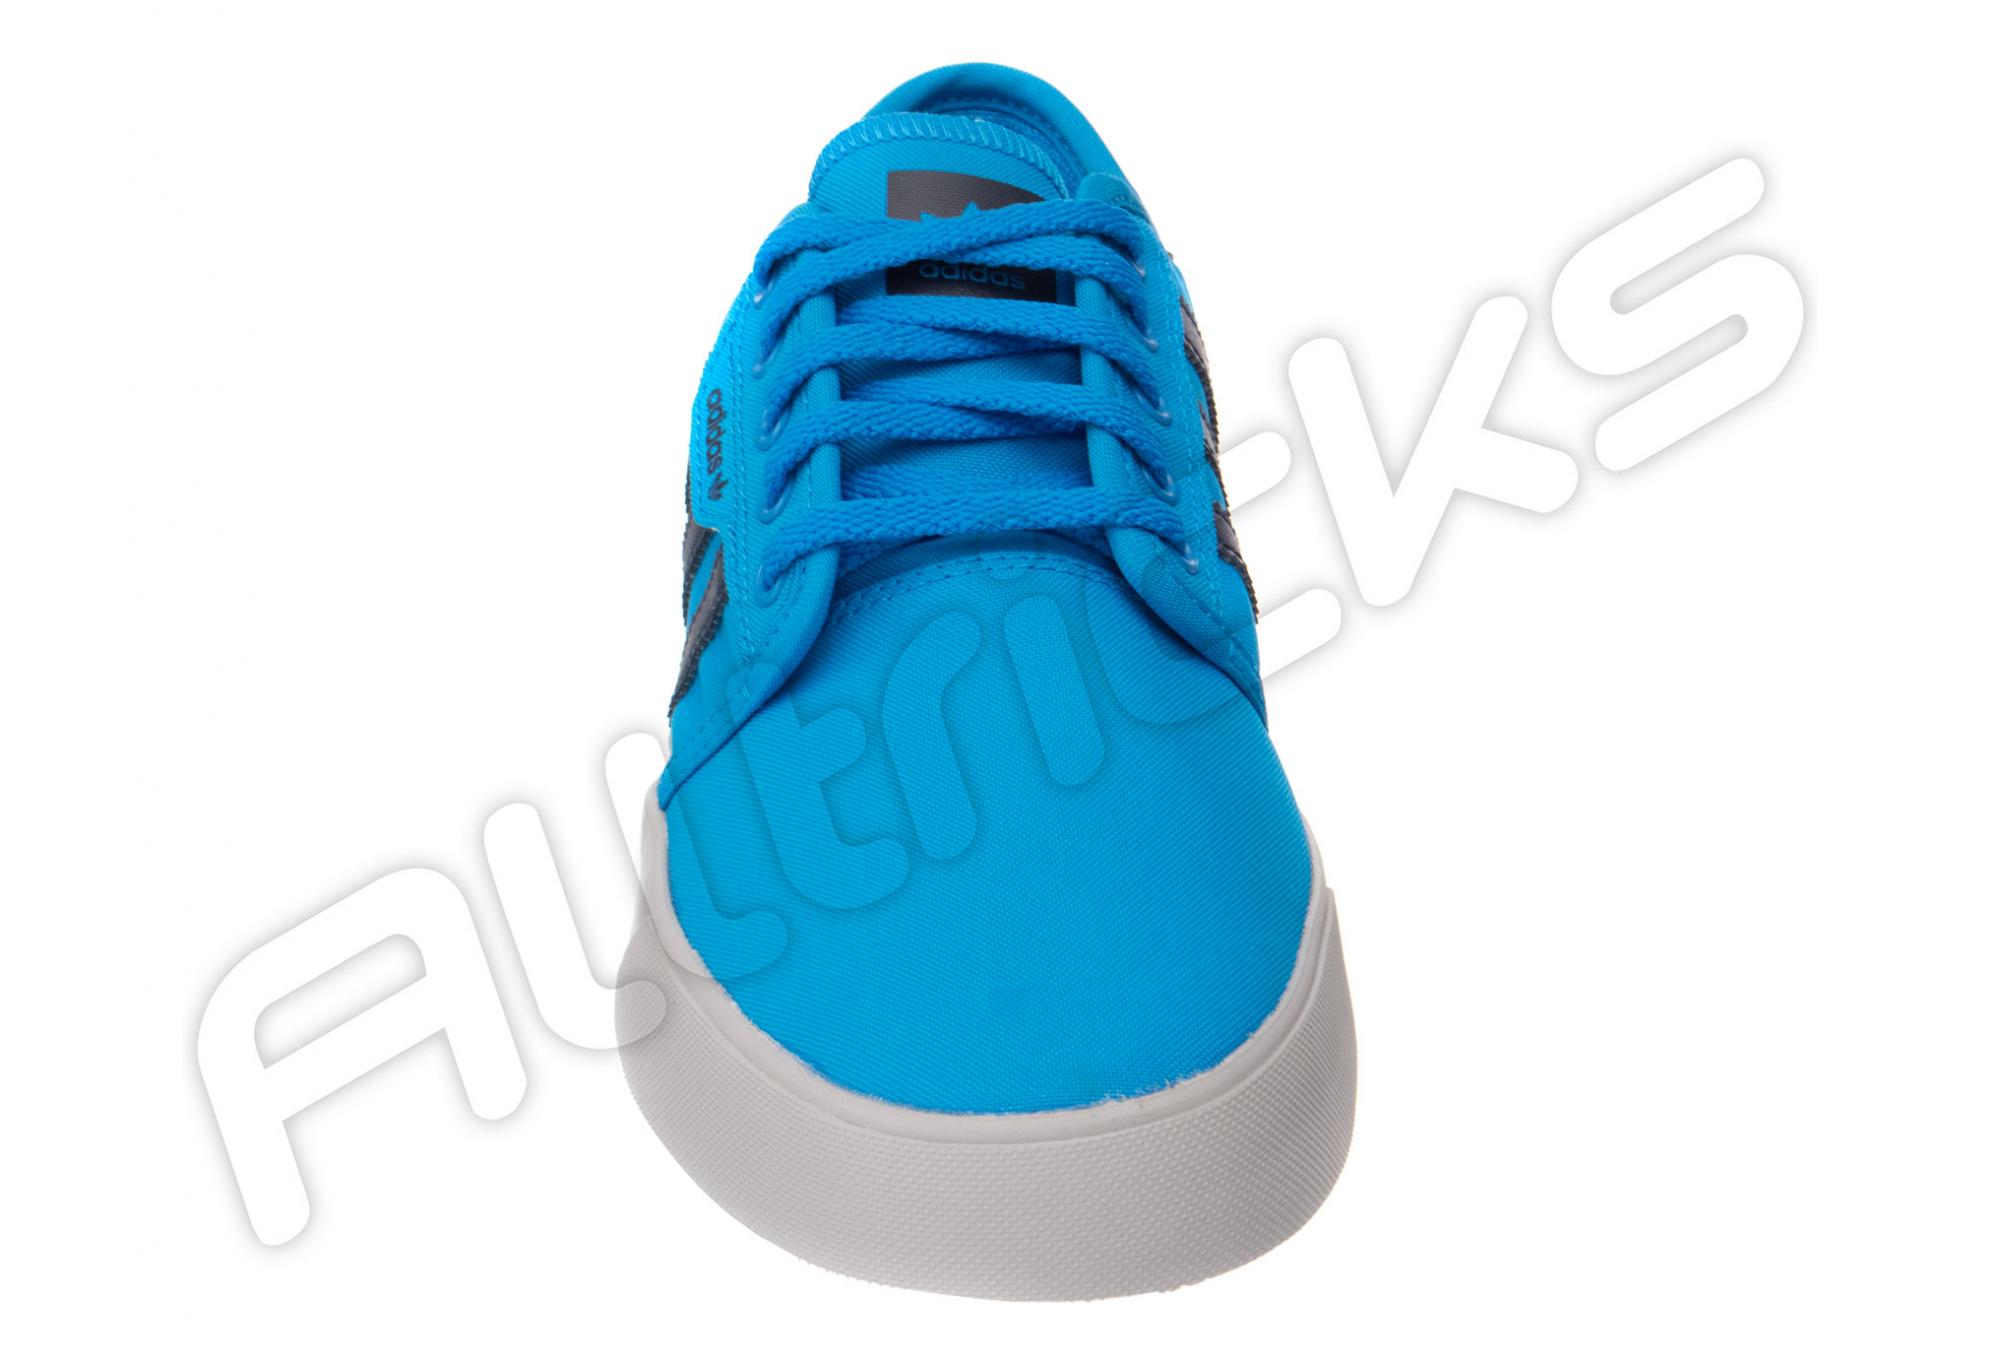 Chaussures Troy Lee Designs Seeley LTD Adidas Team Bleu